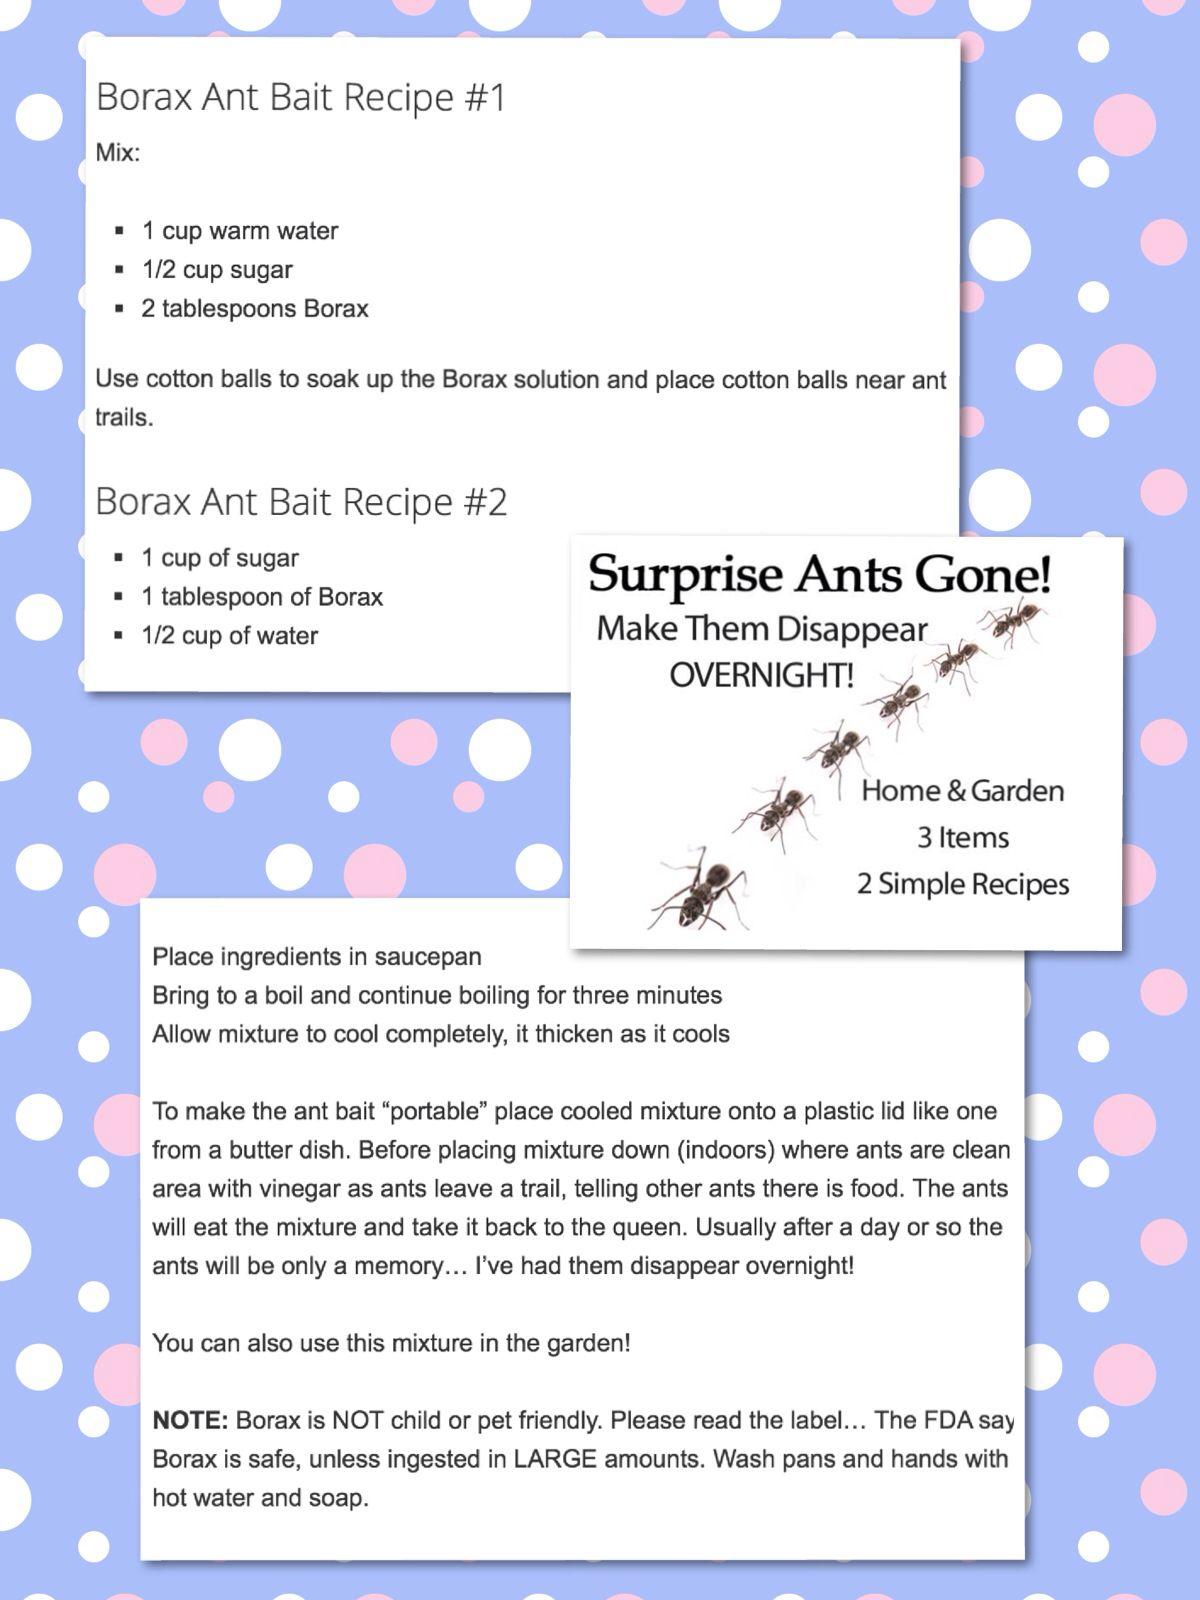 Get rid of ants overnight borax solution get rid